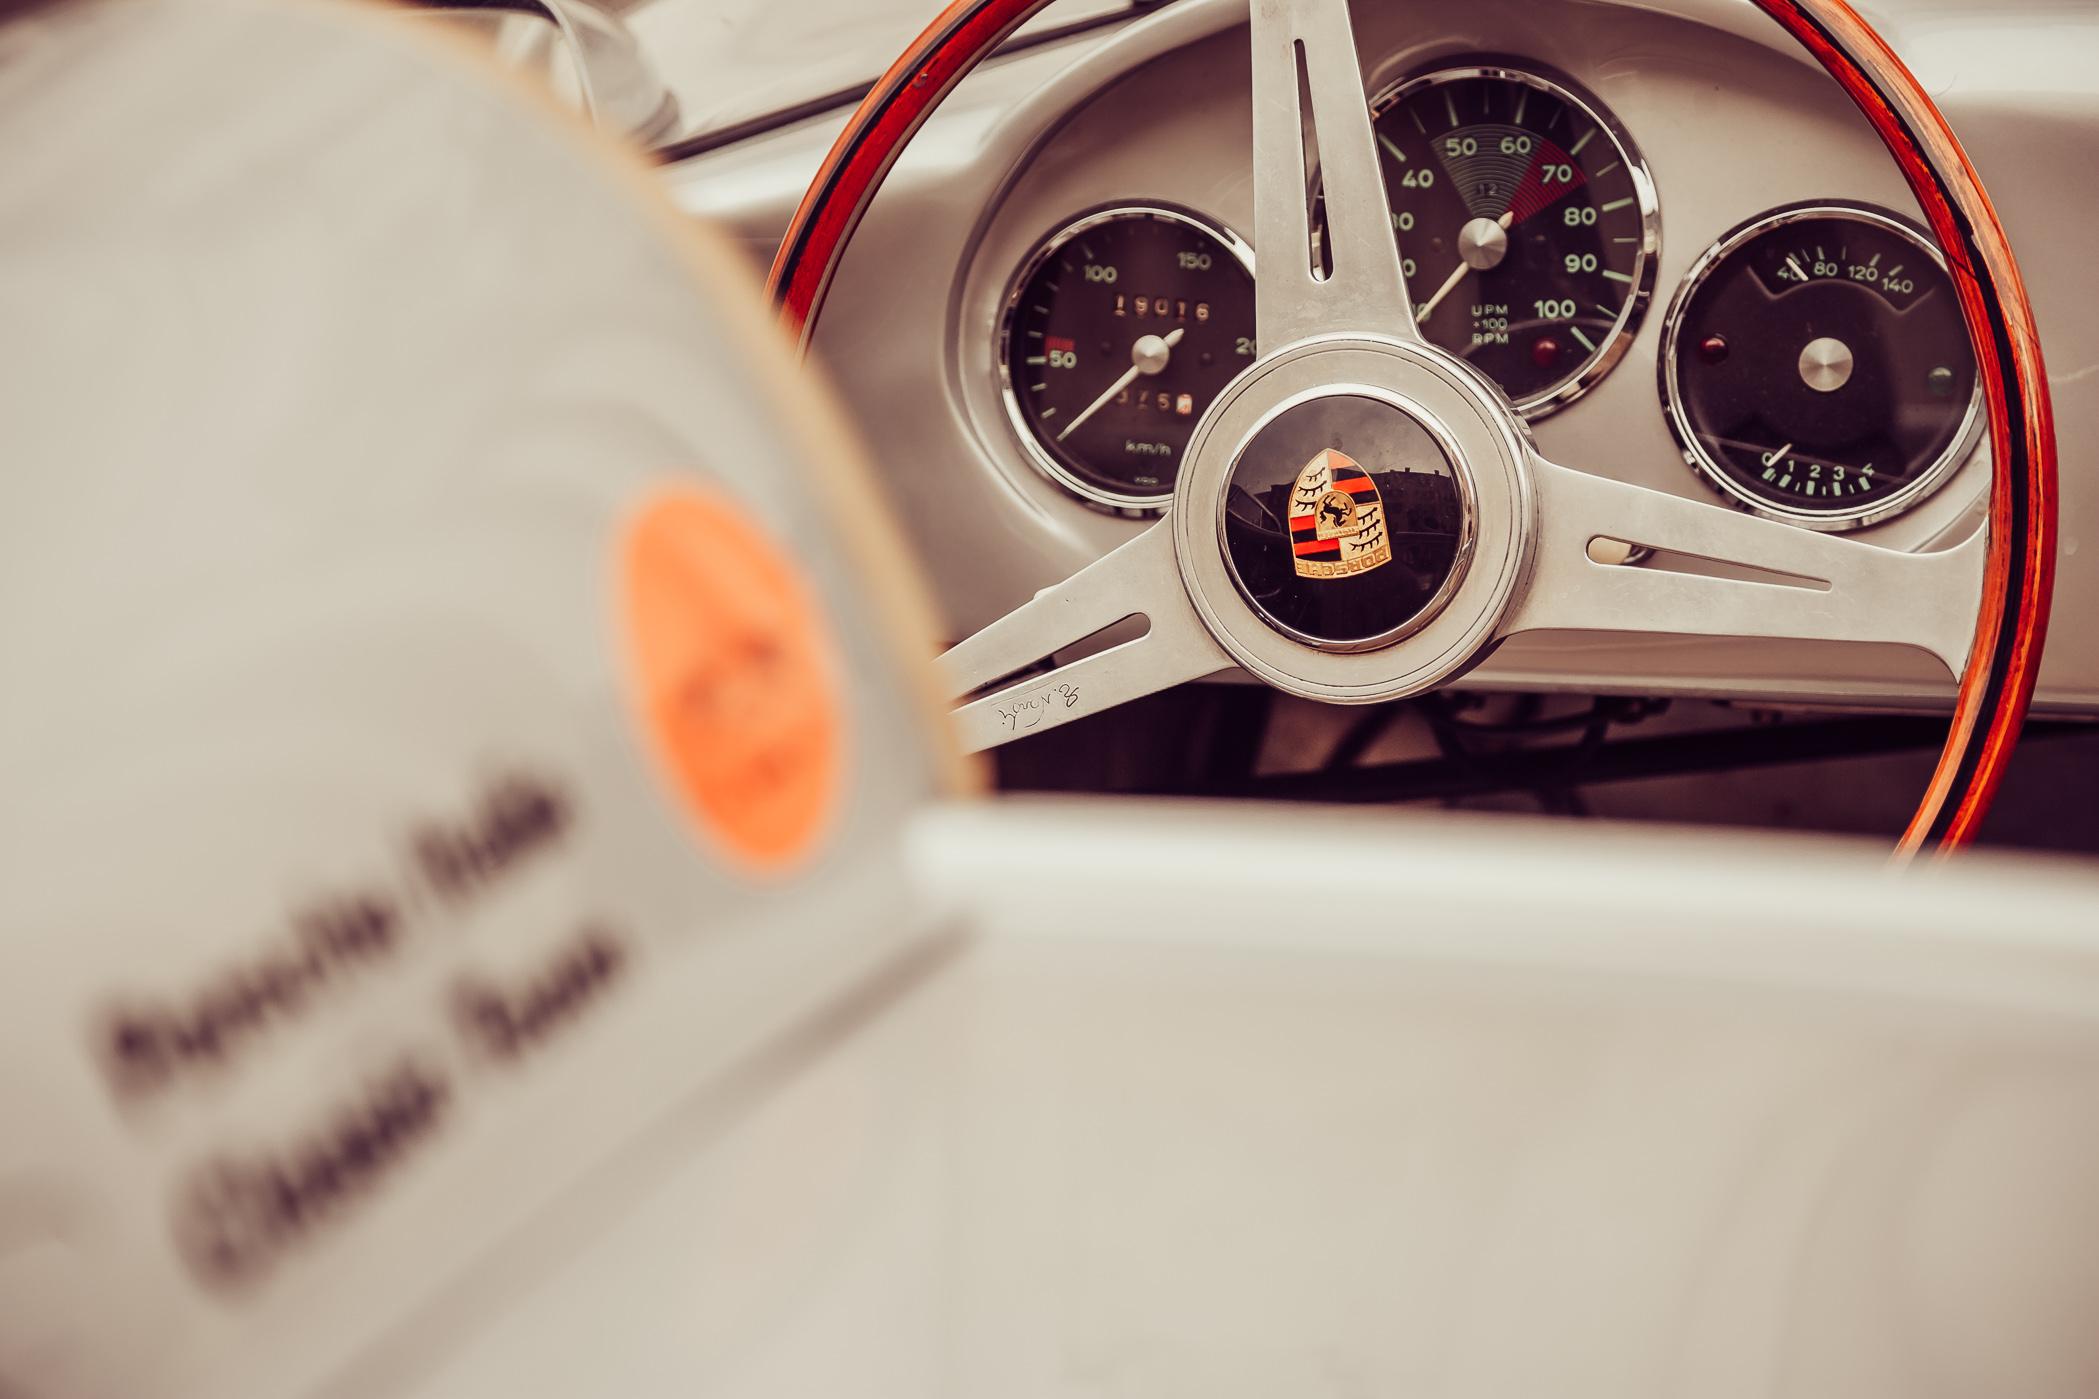 Mille Miglia, Florian Kresse, Autofotografie, carphotography, Oldtimer, Porsche, Porsche Spyder 550, Vintage car